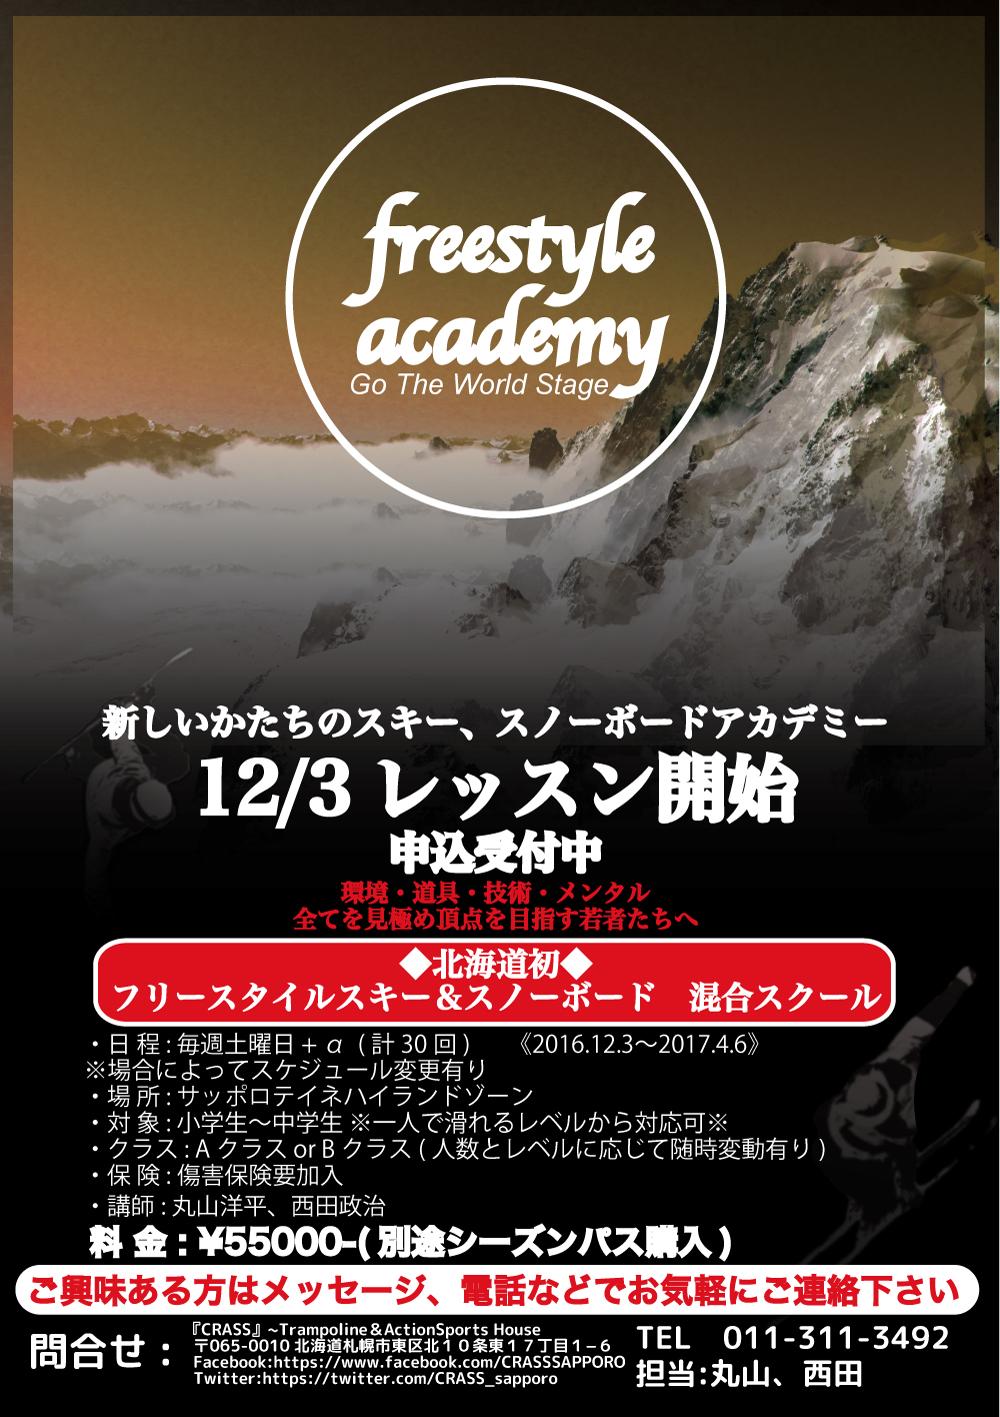 freestyleacademy-flyer1